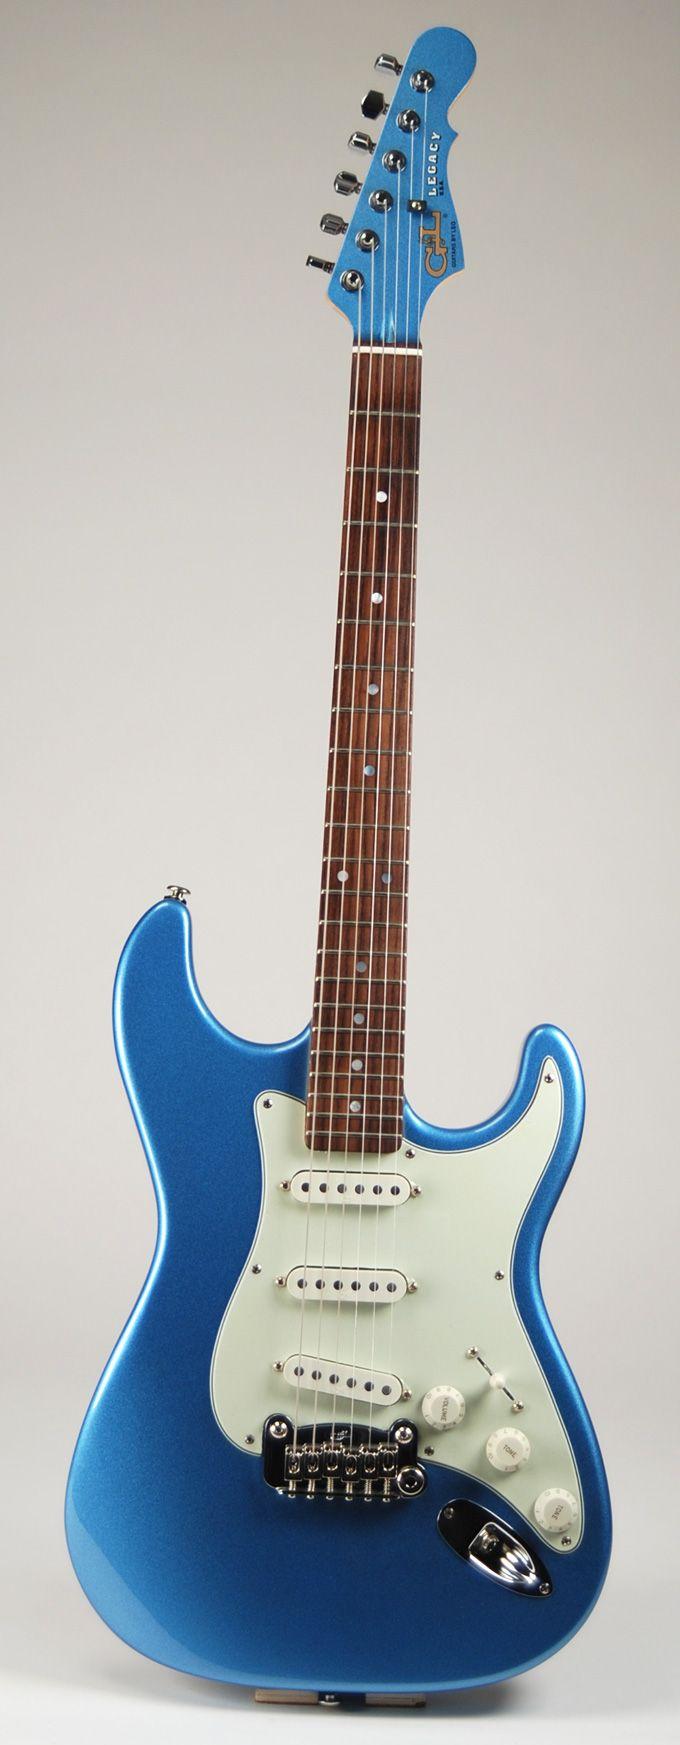 G&L Legacy Double Cutaway Guitar